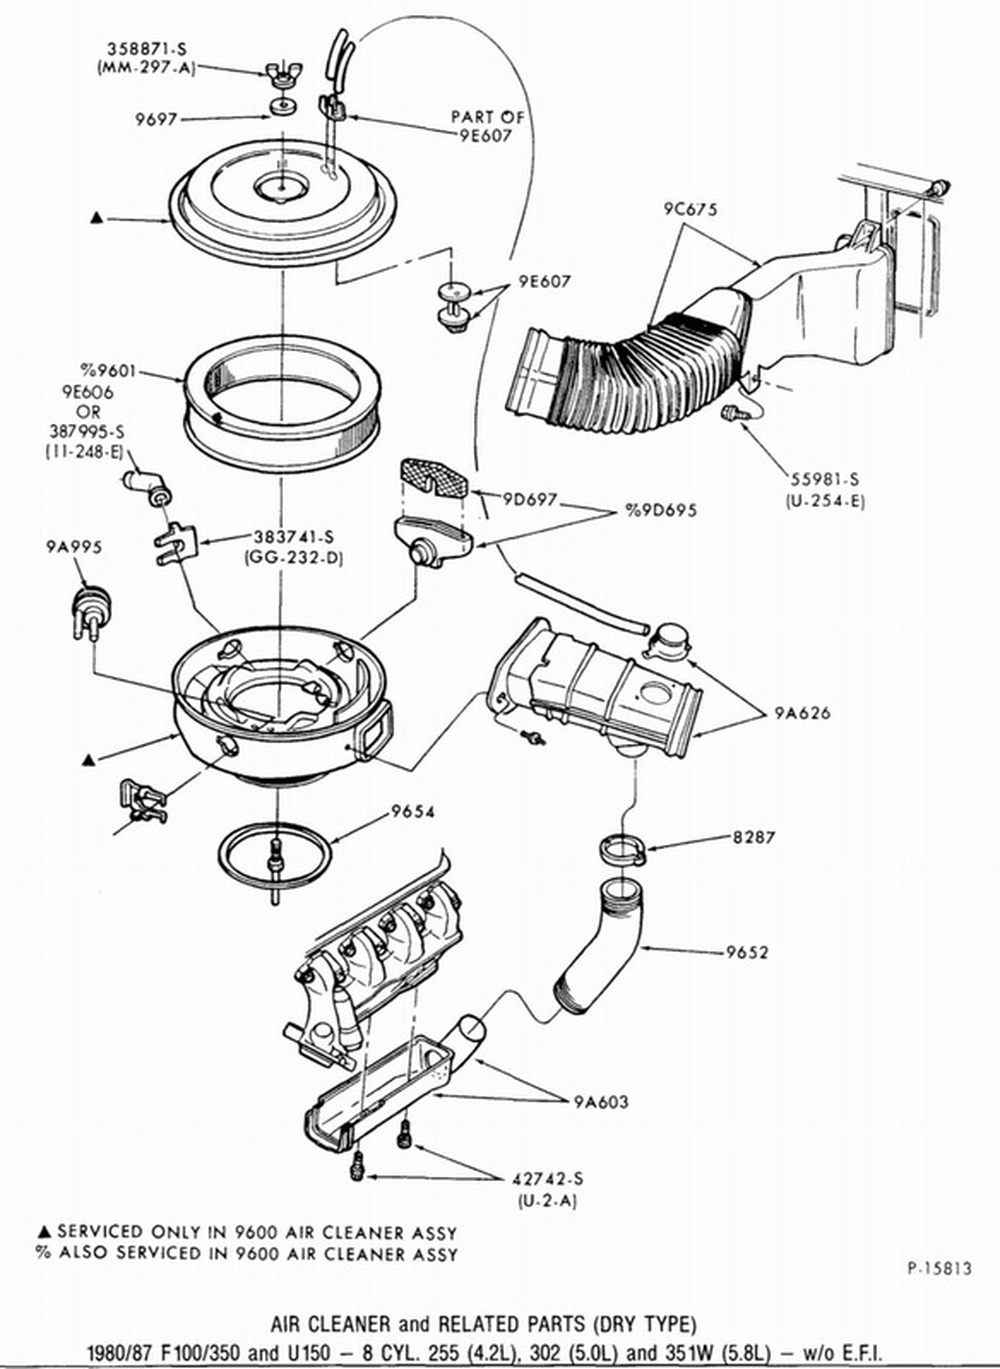 302 ford engine diagram fuel pressure